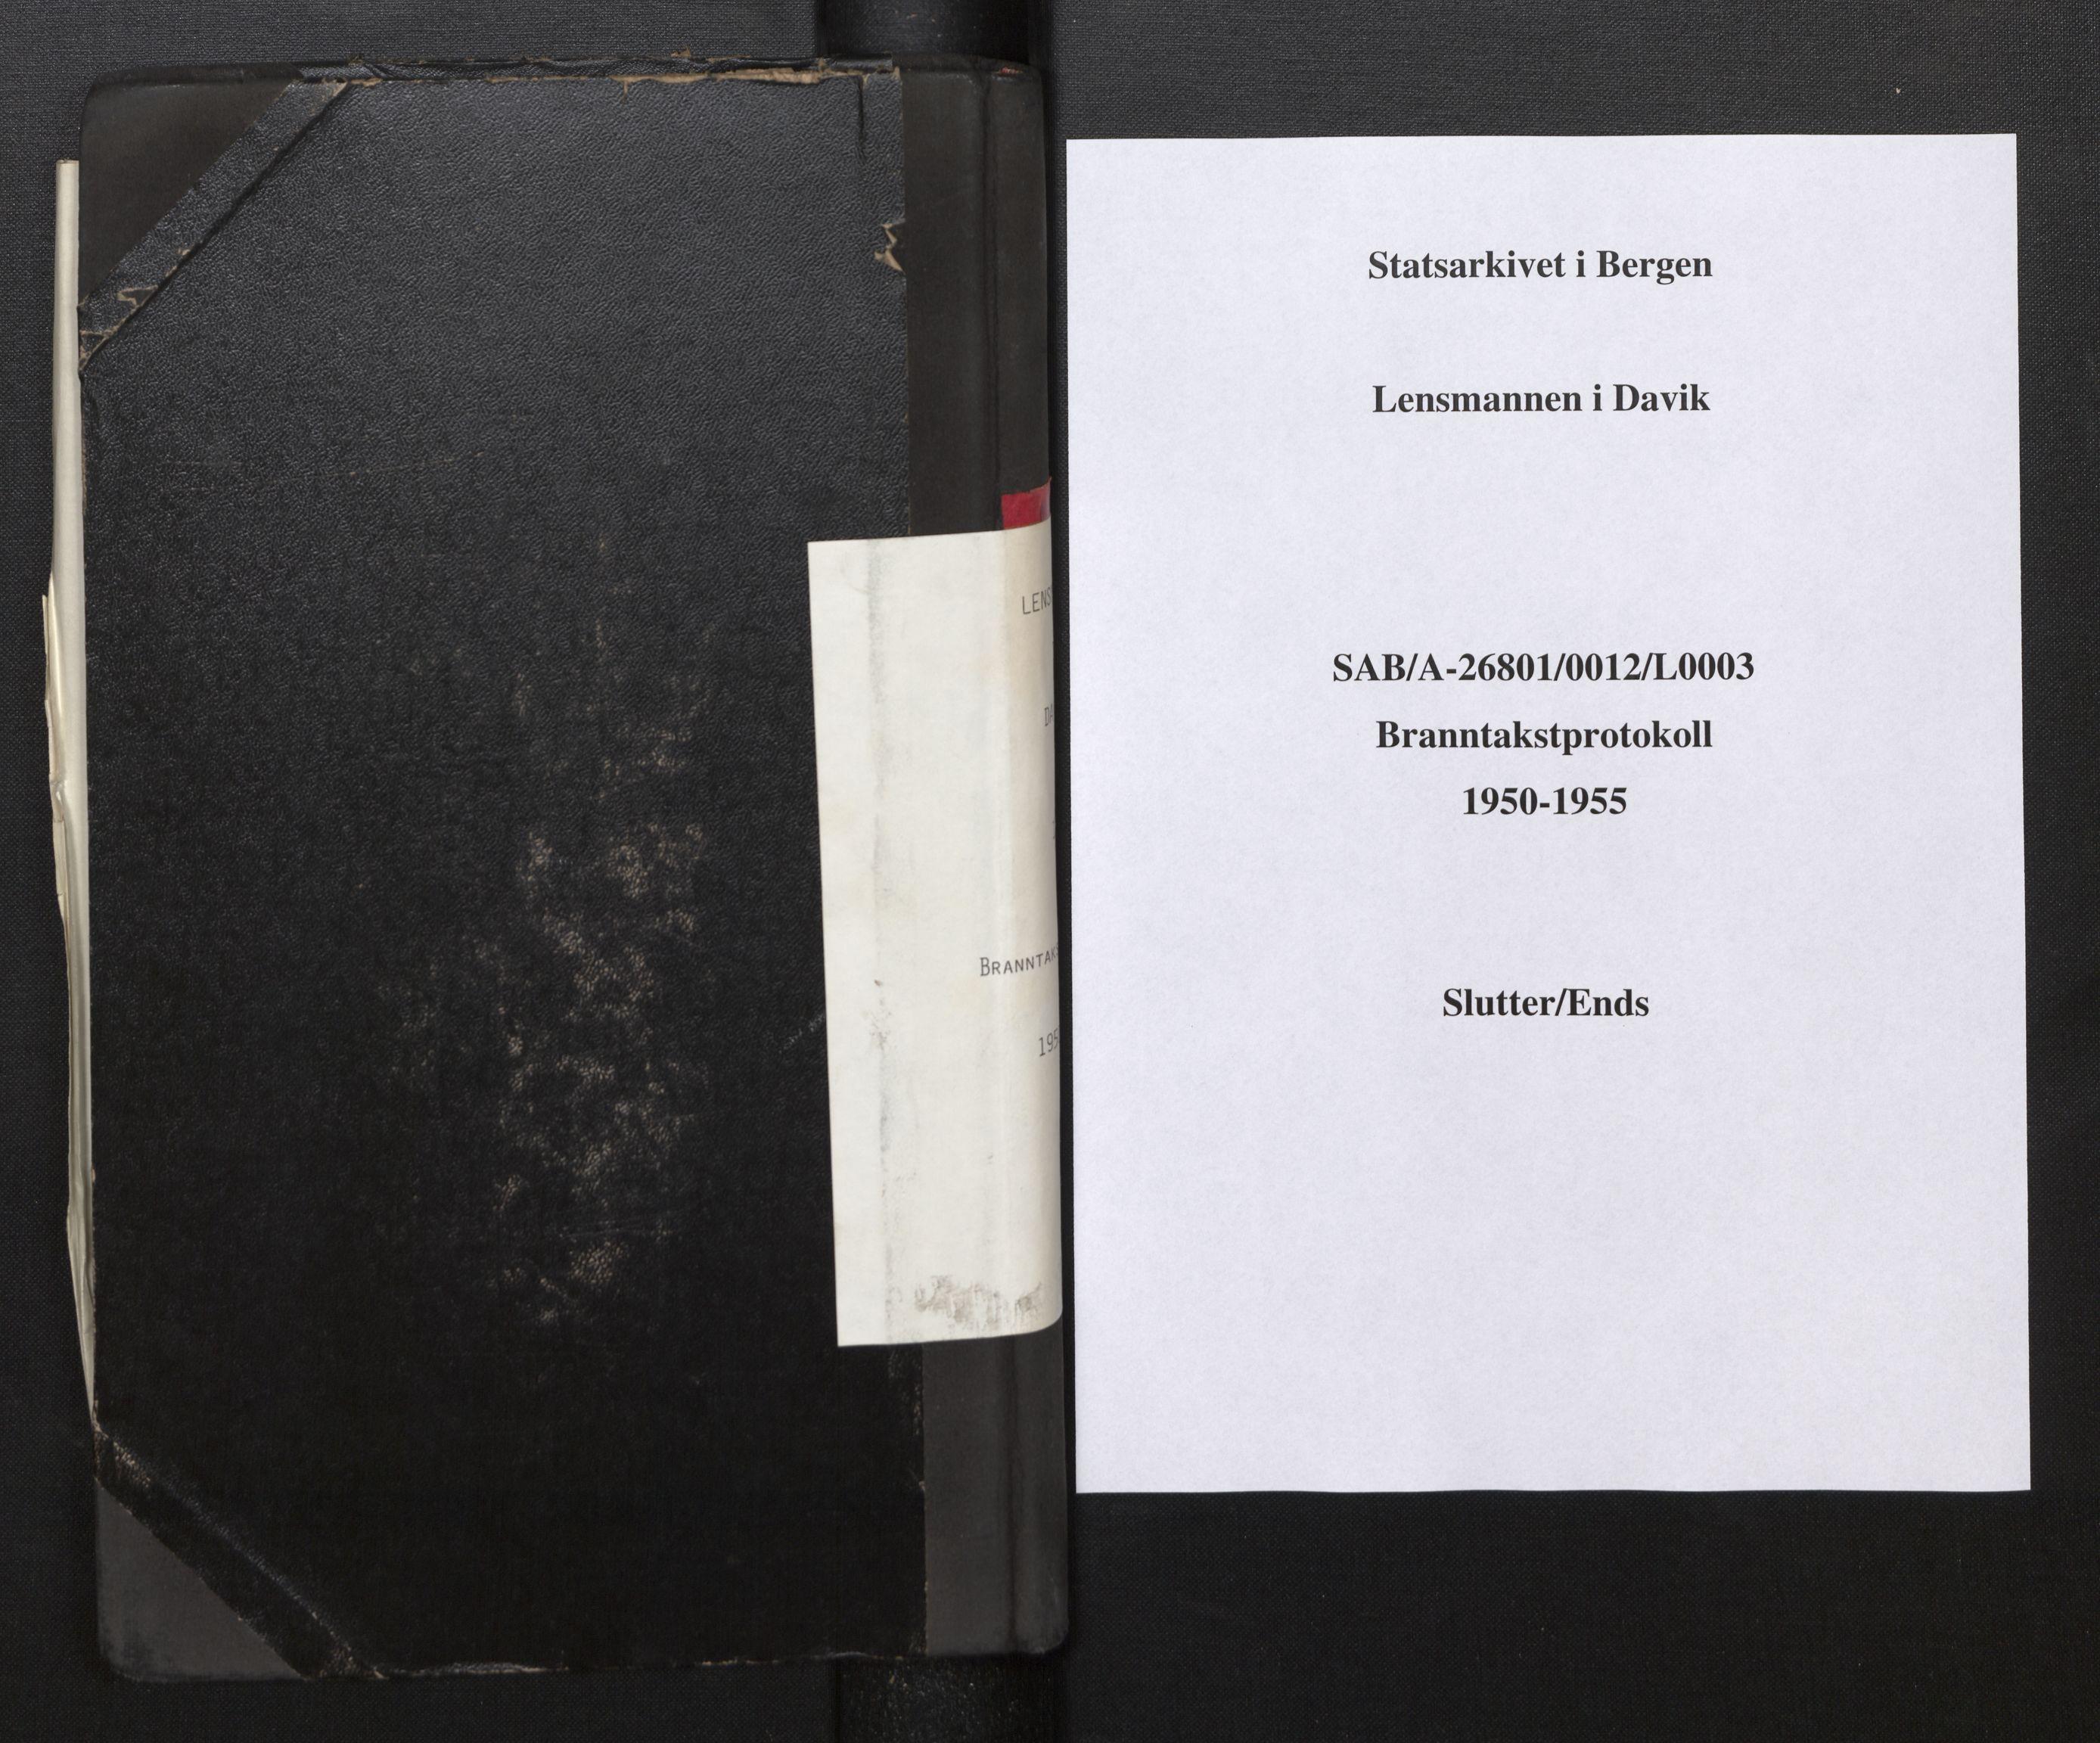 SAB, Lensmannen i Davik, 0012/L0003: Branntakstprotokoll, 1950-1955